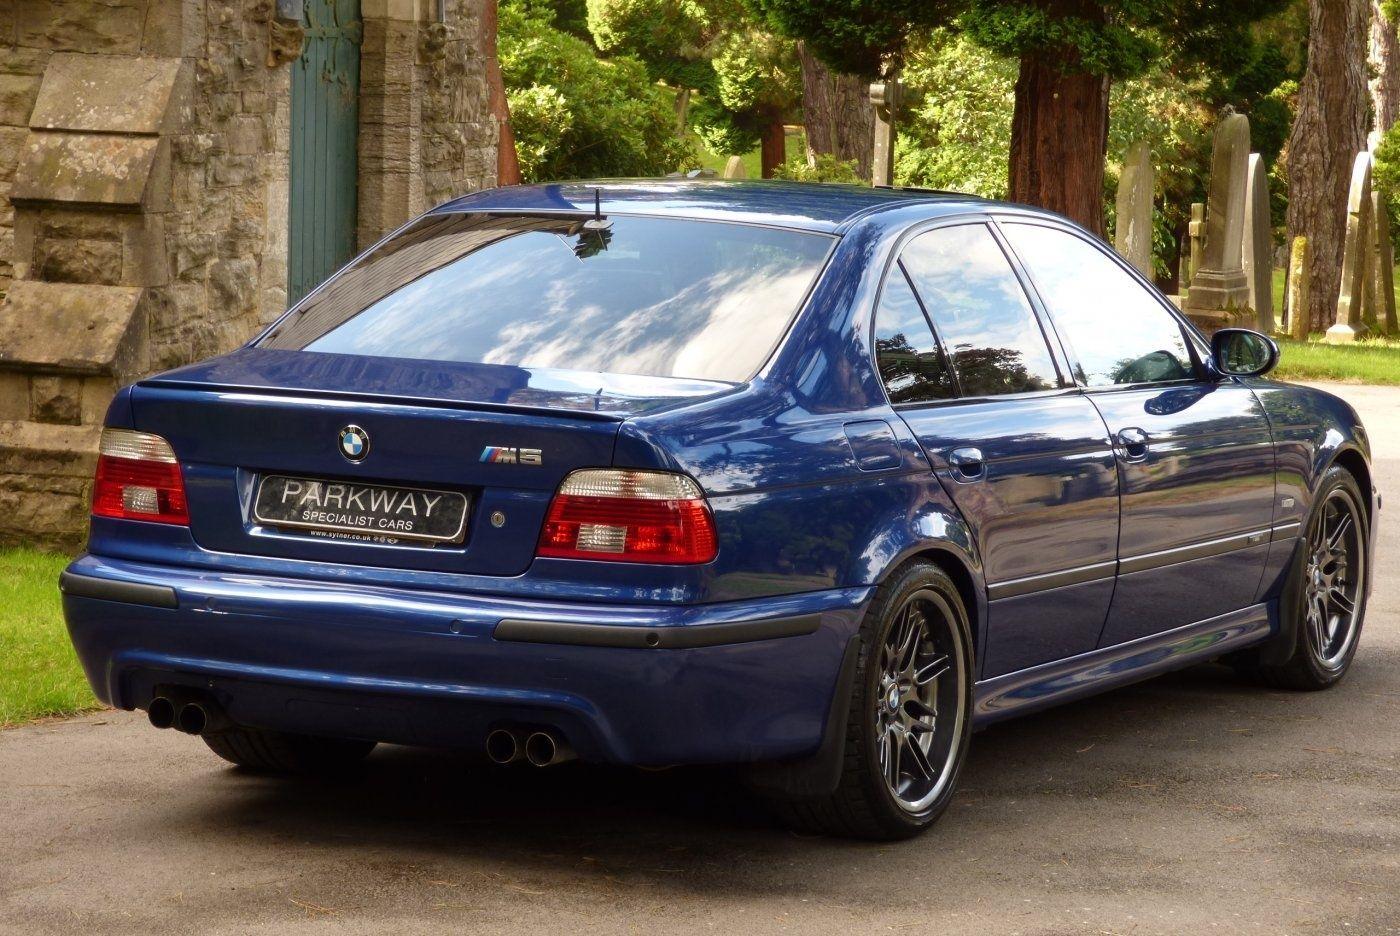 2001 Bmw M5 M5 E39 V8 Classic Driver Market With Images